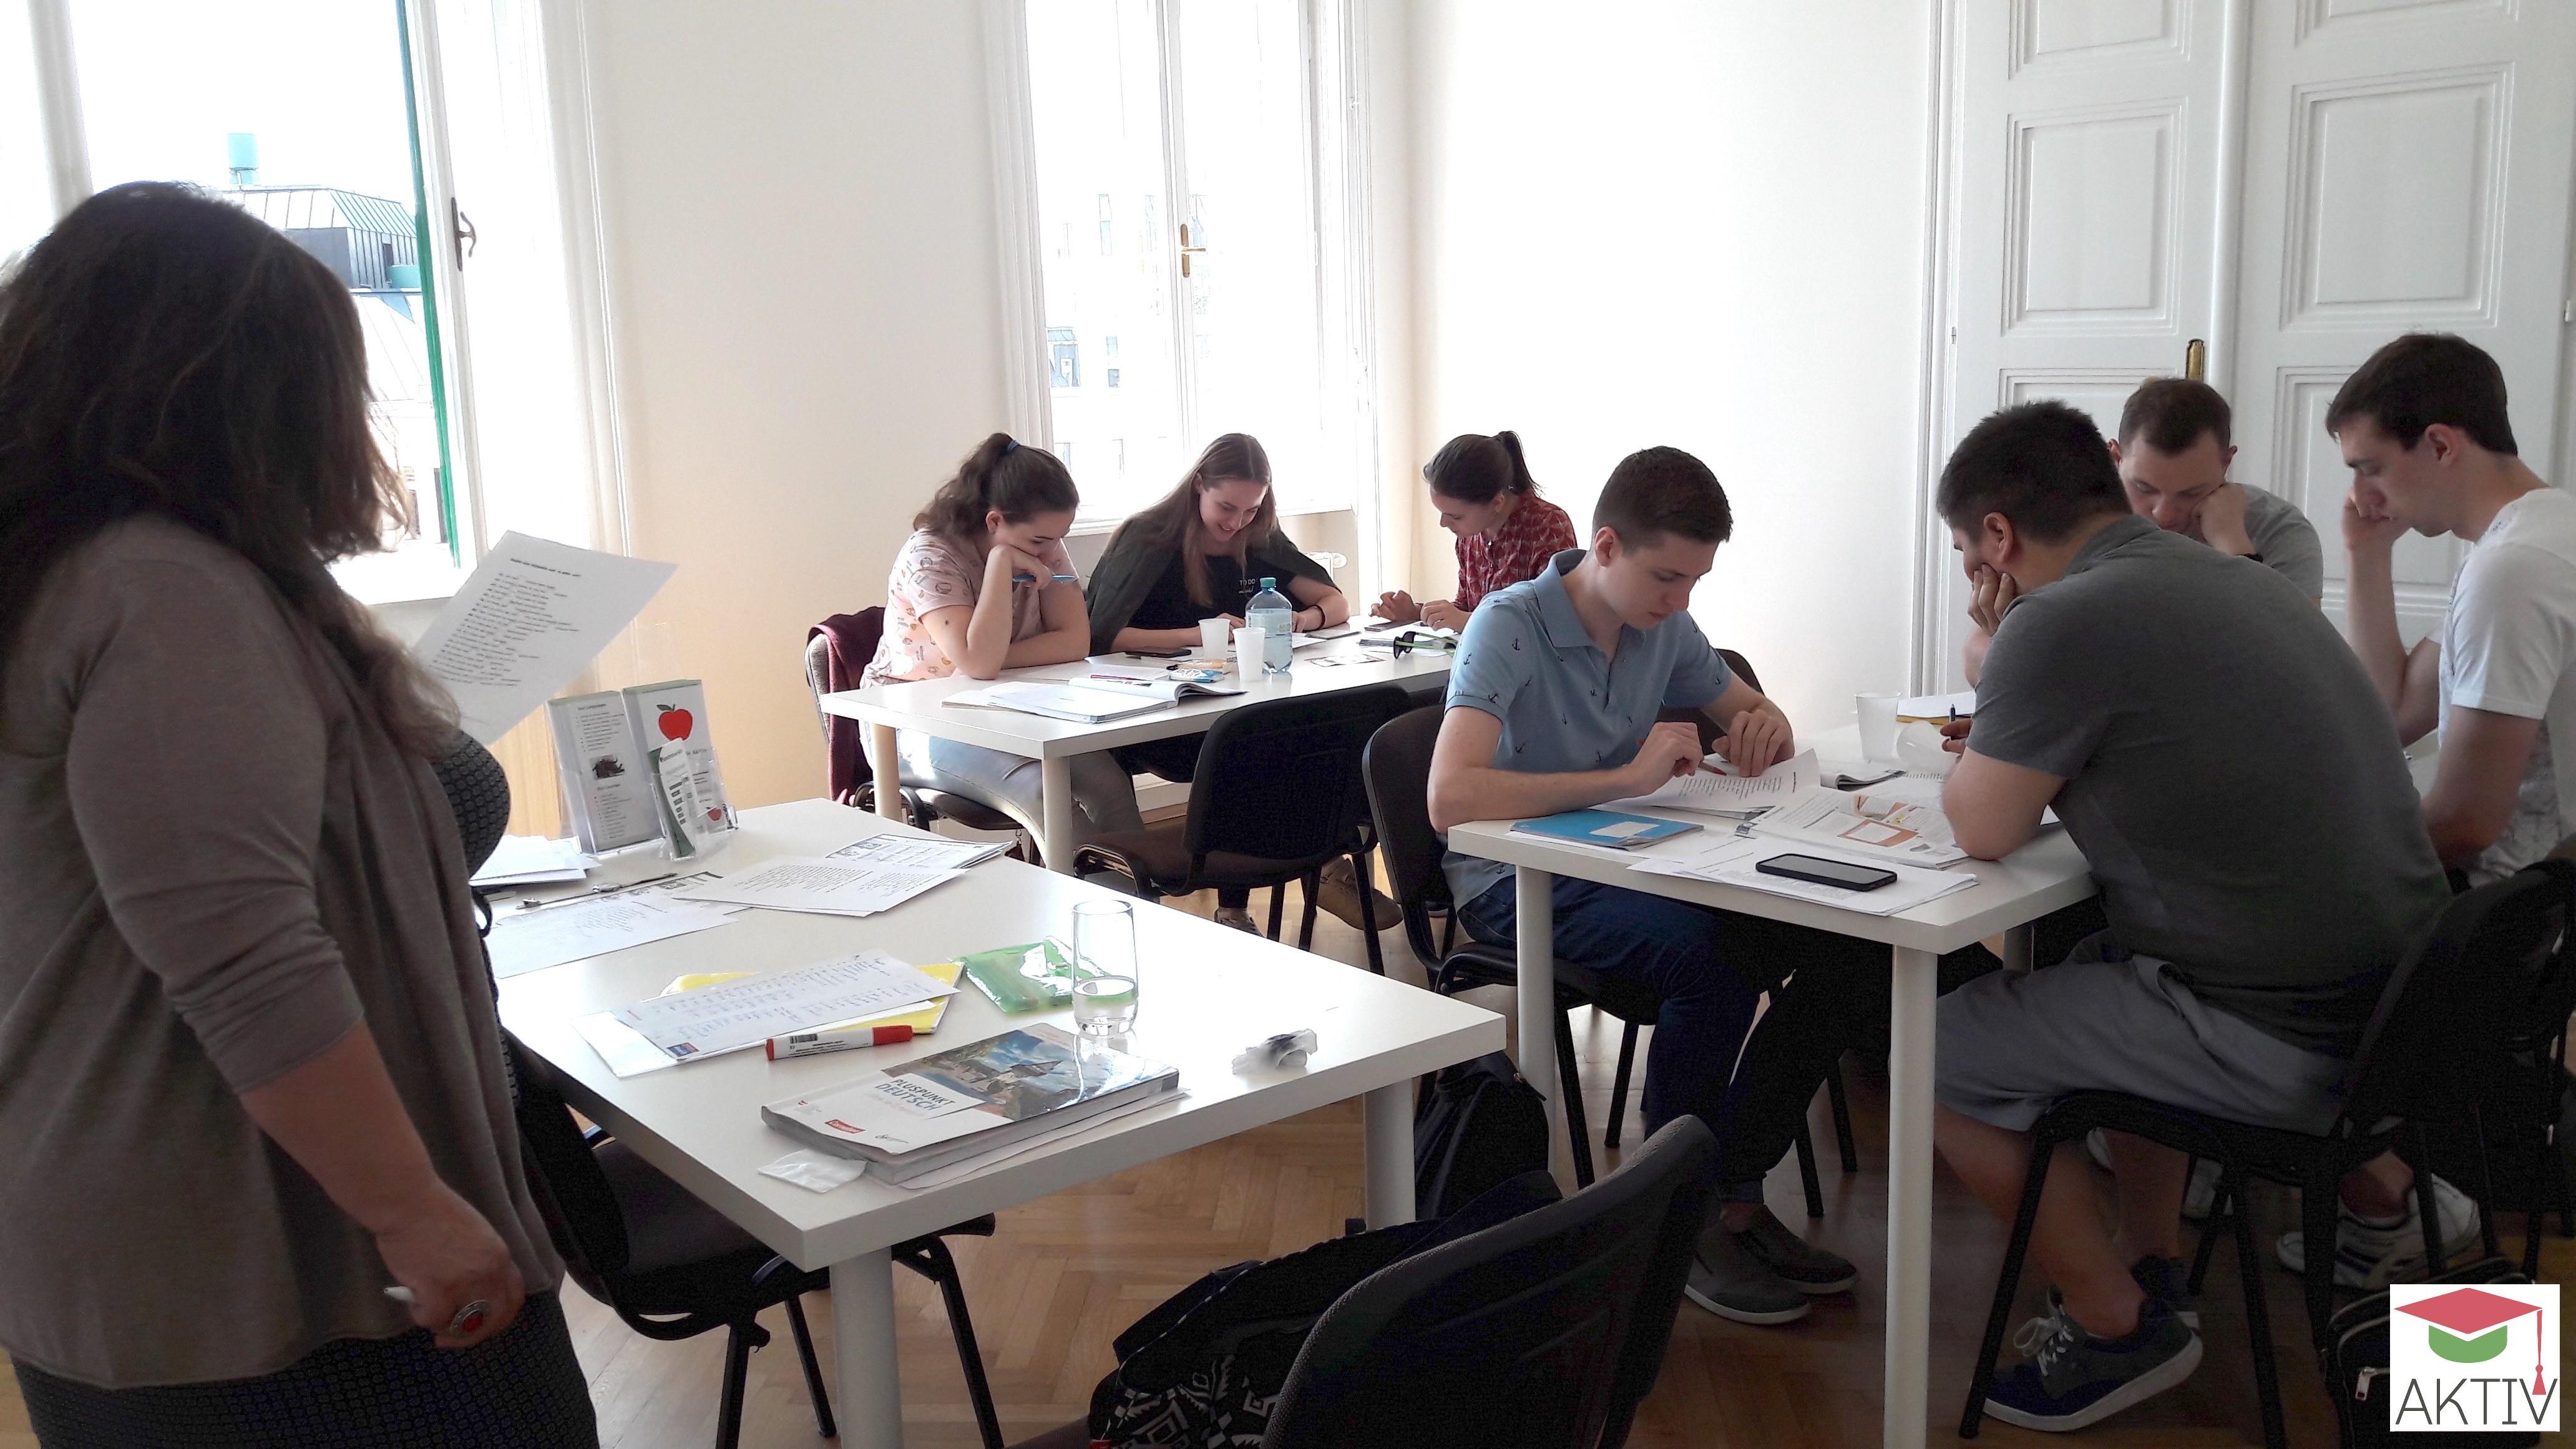 Corsi di preparazione per gli esami ÖIF/ÖSD